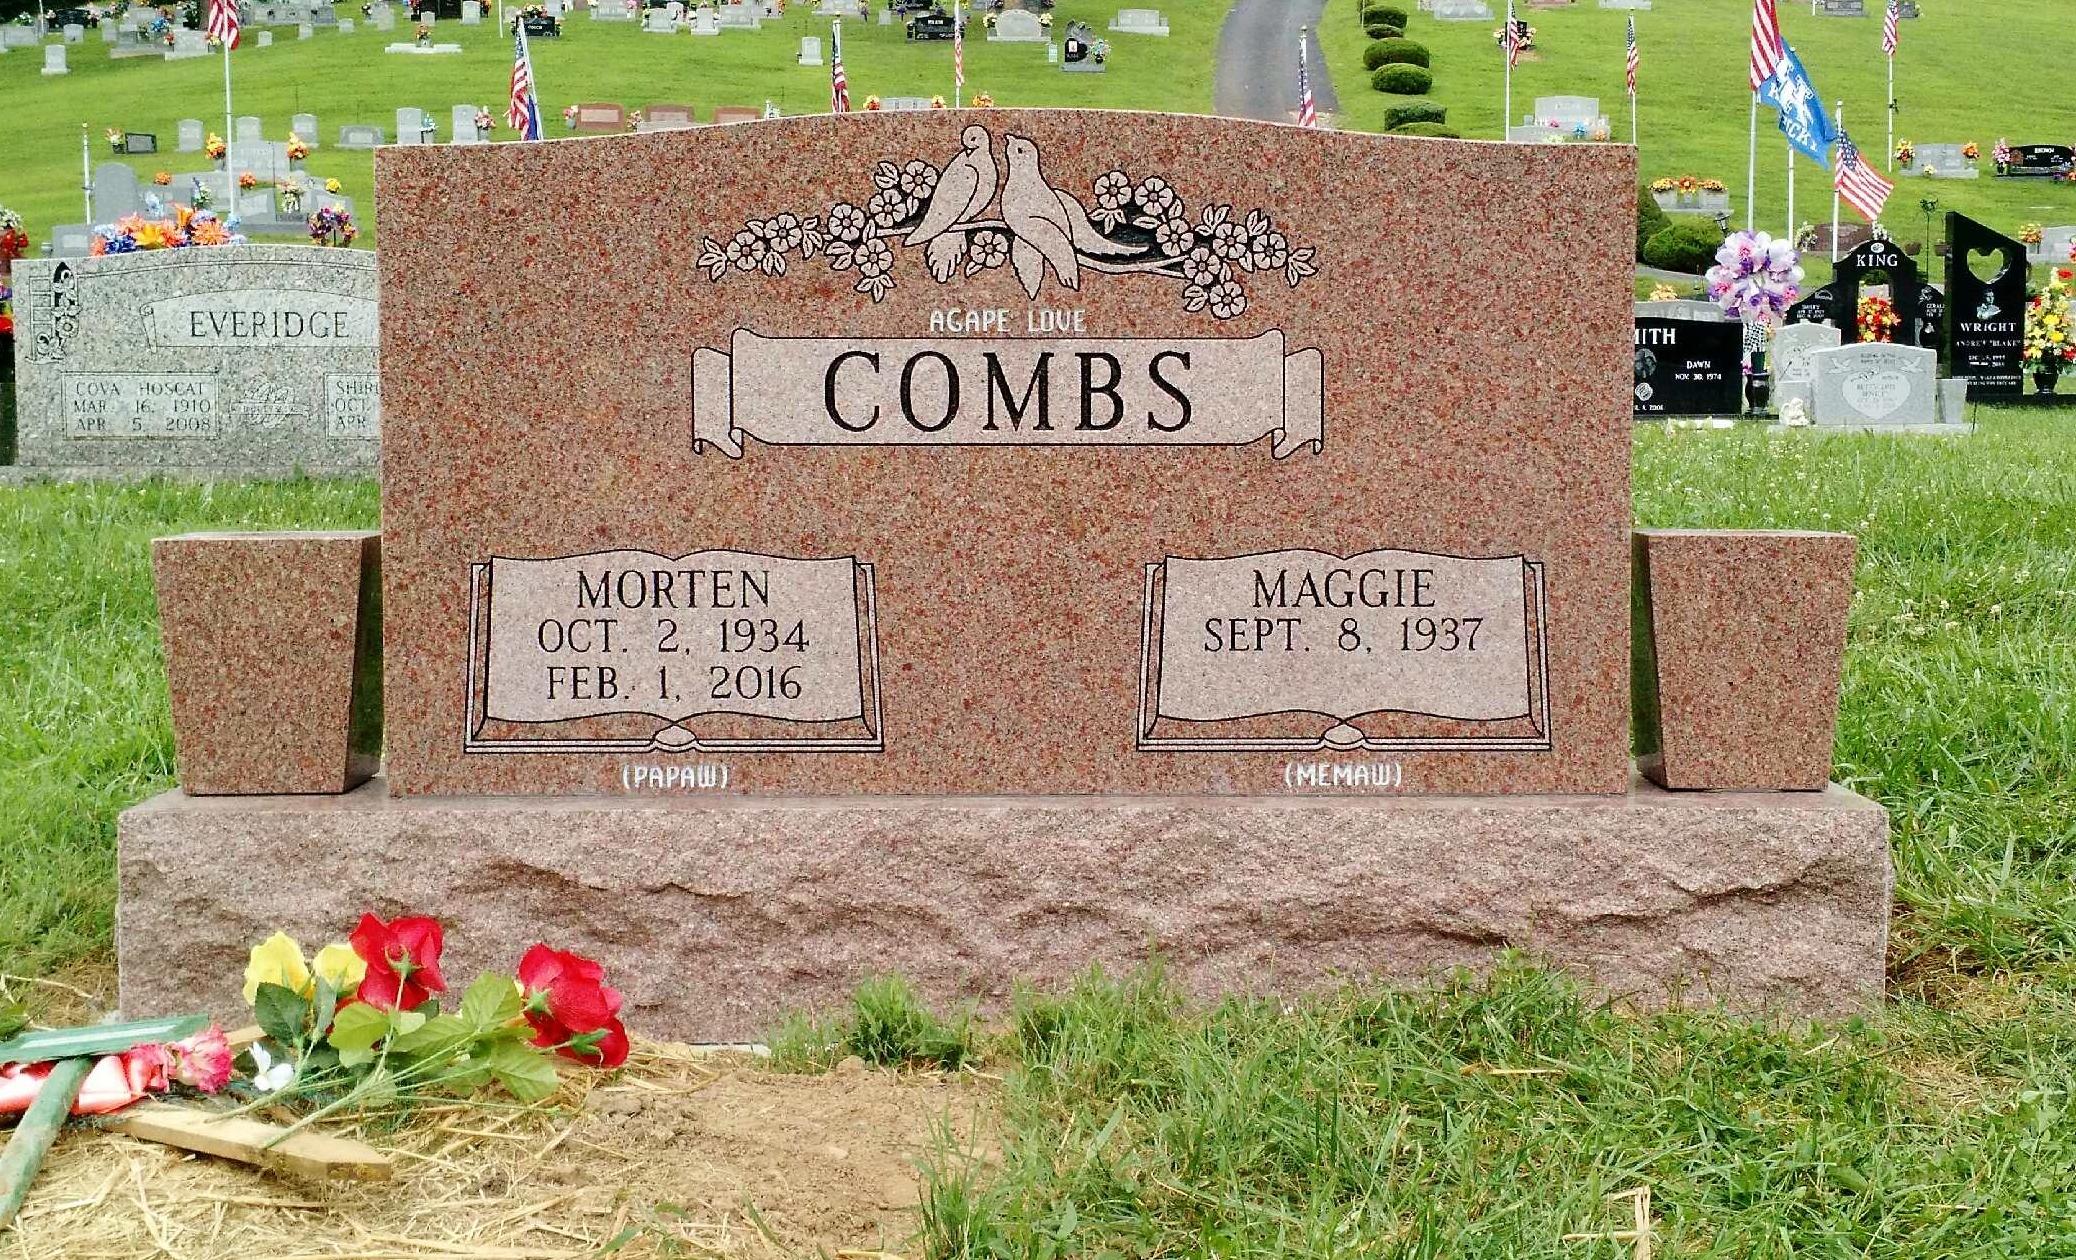 Combs 2